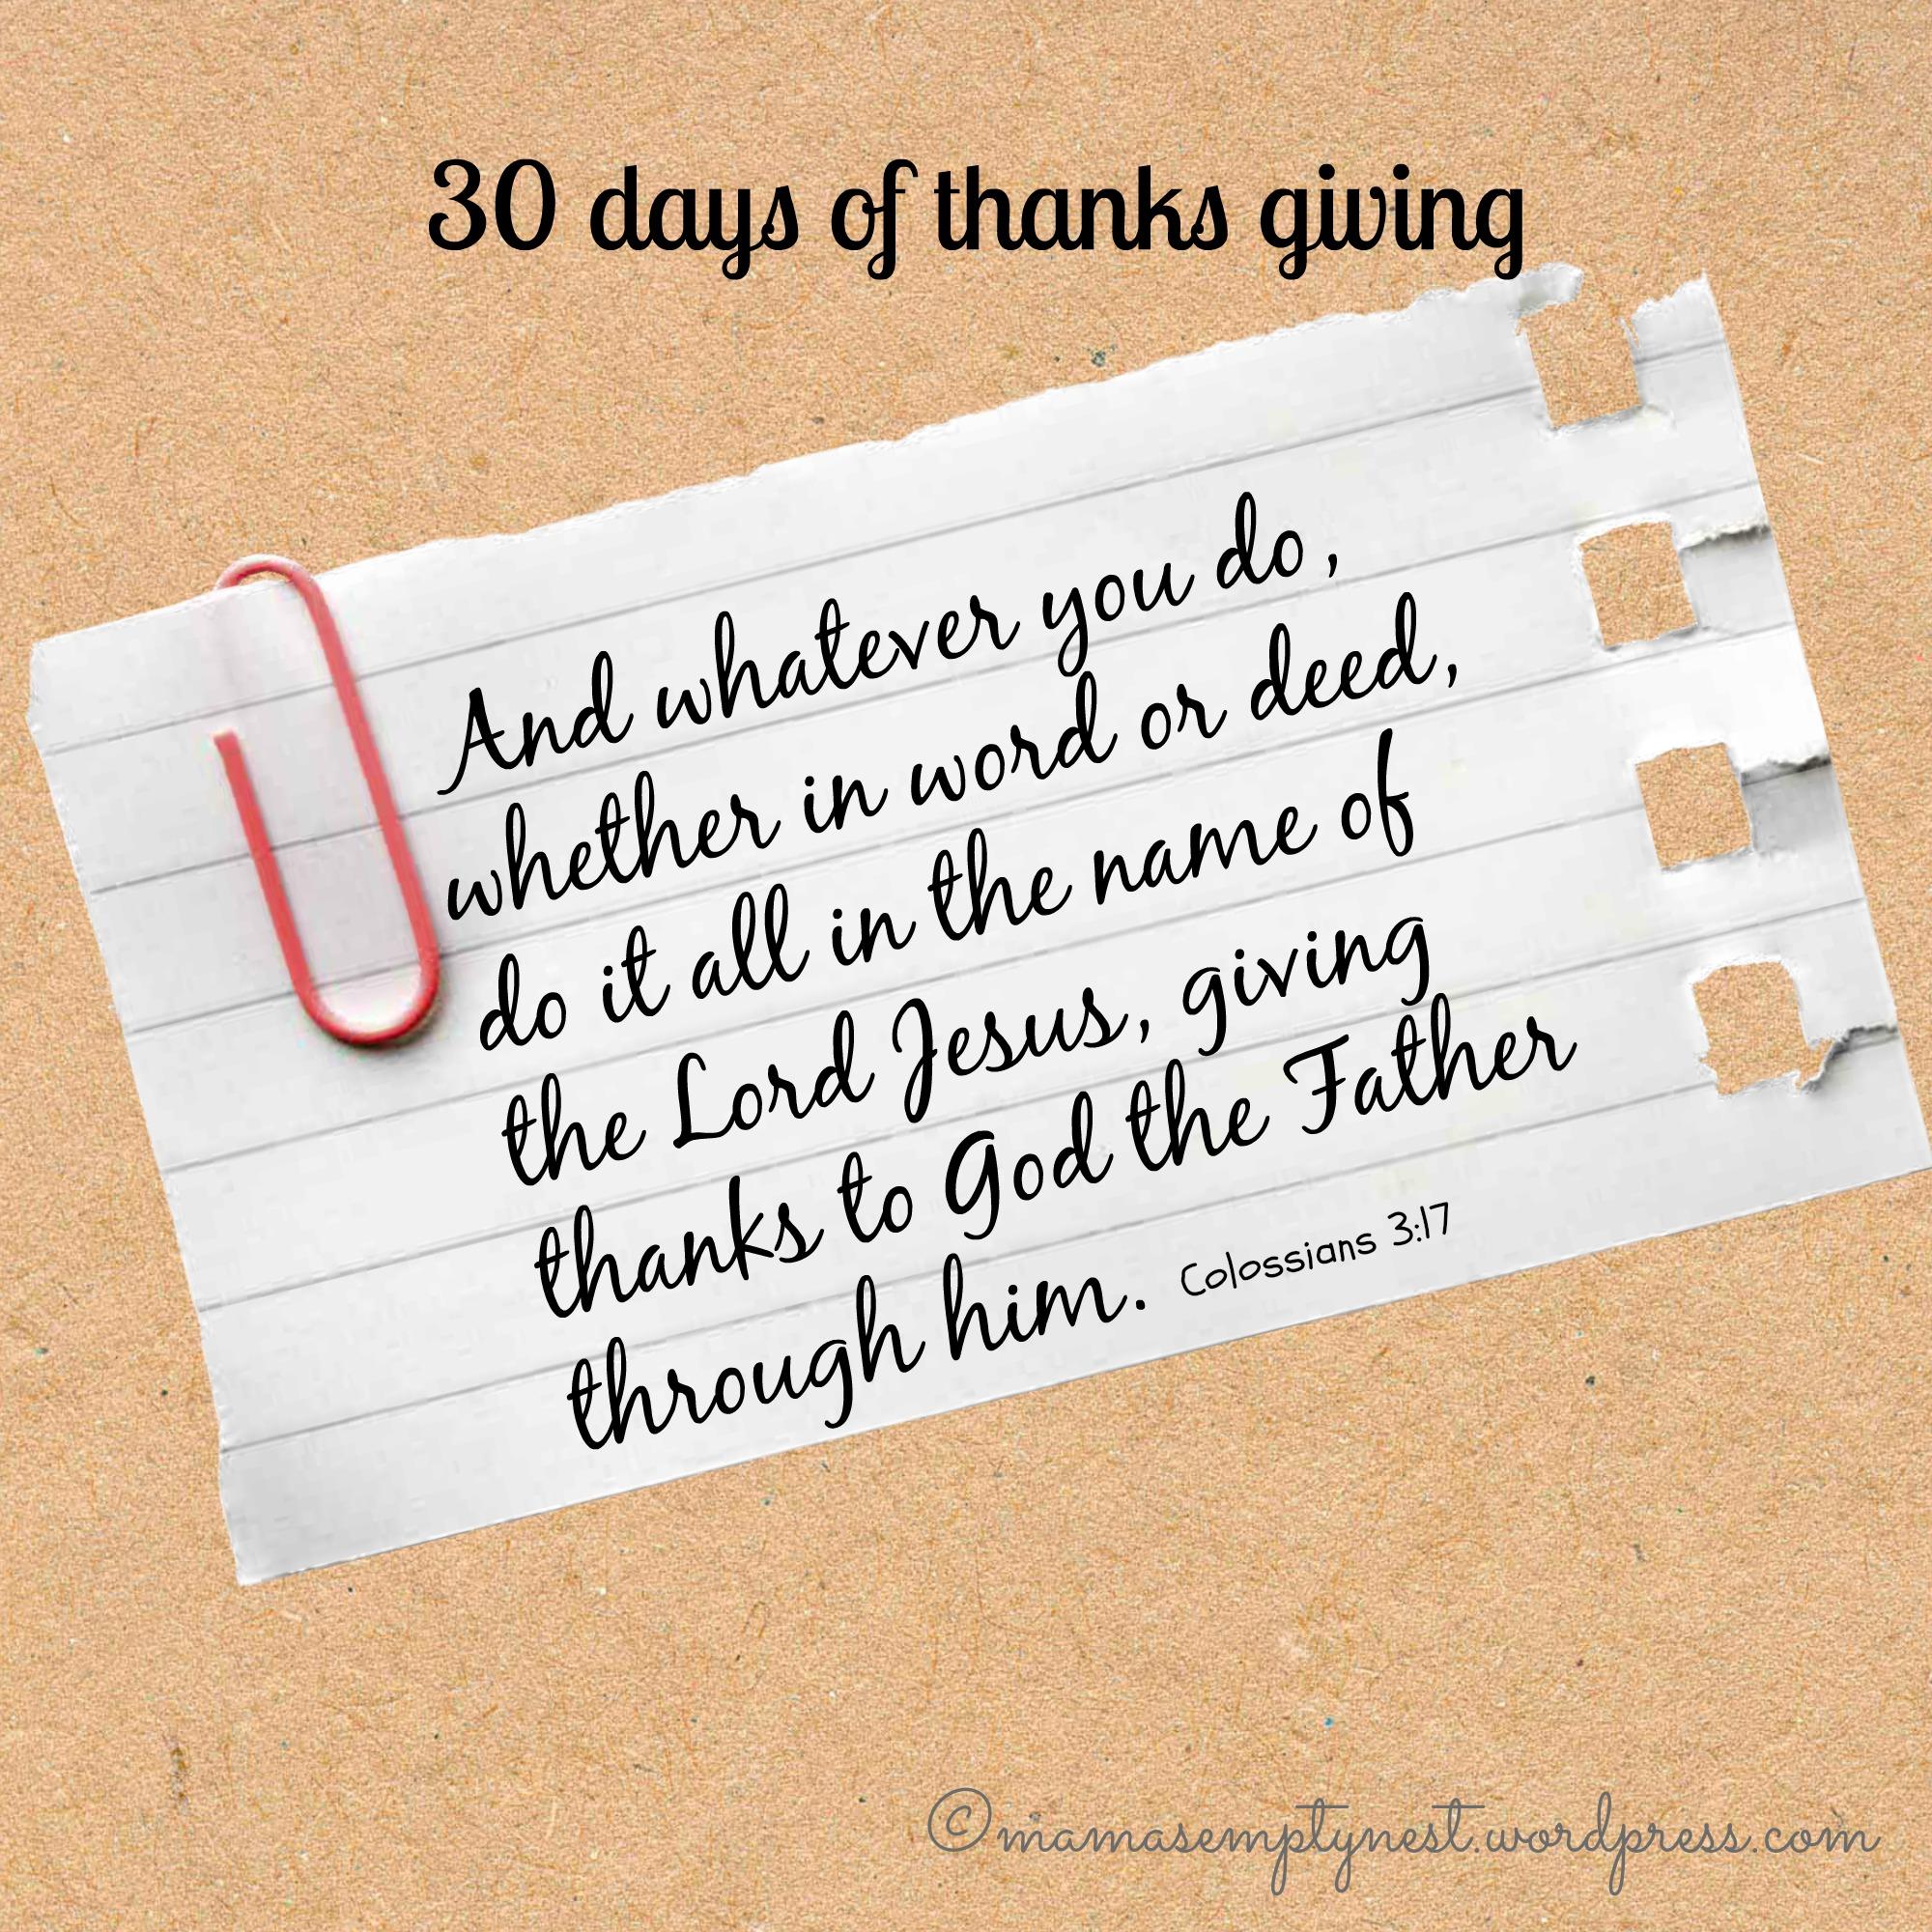 30 days of thanks3